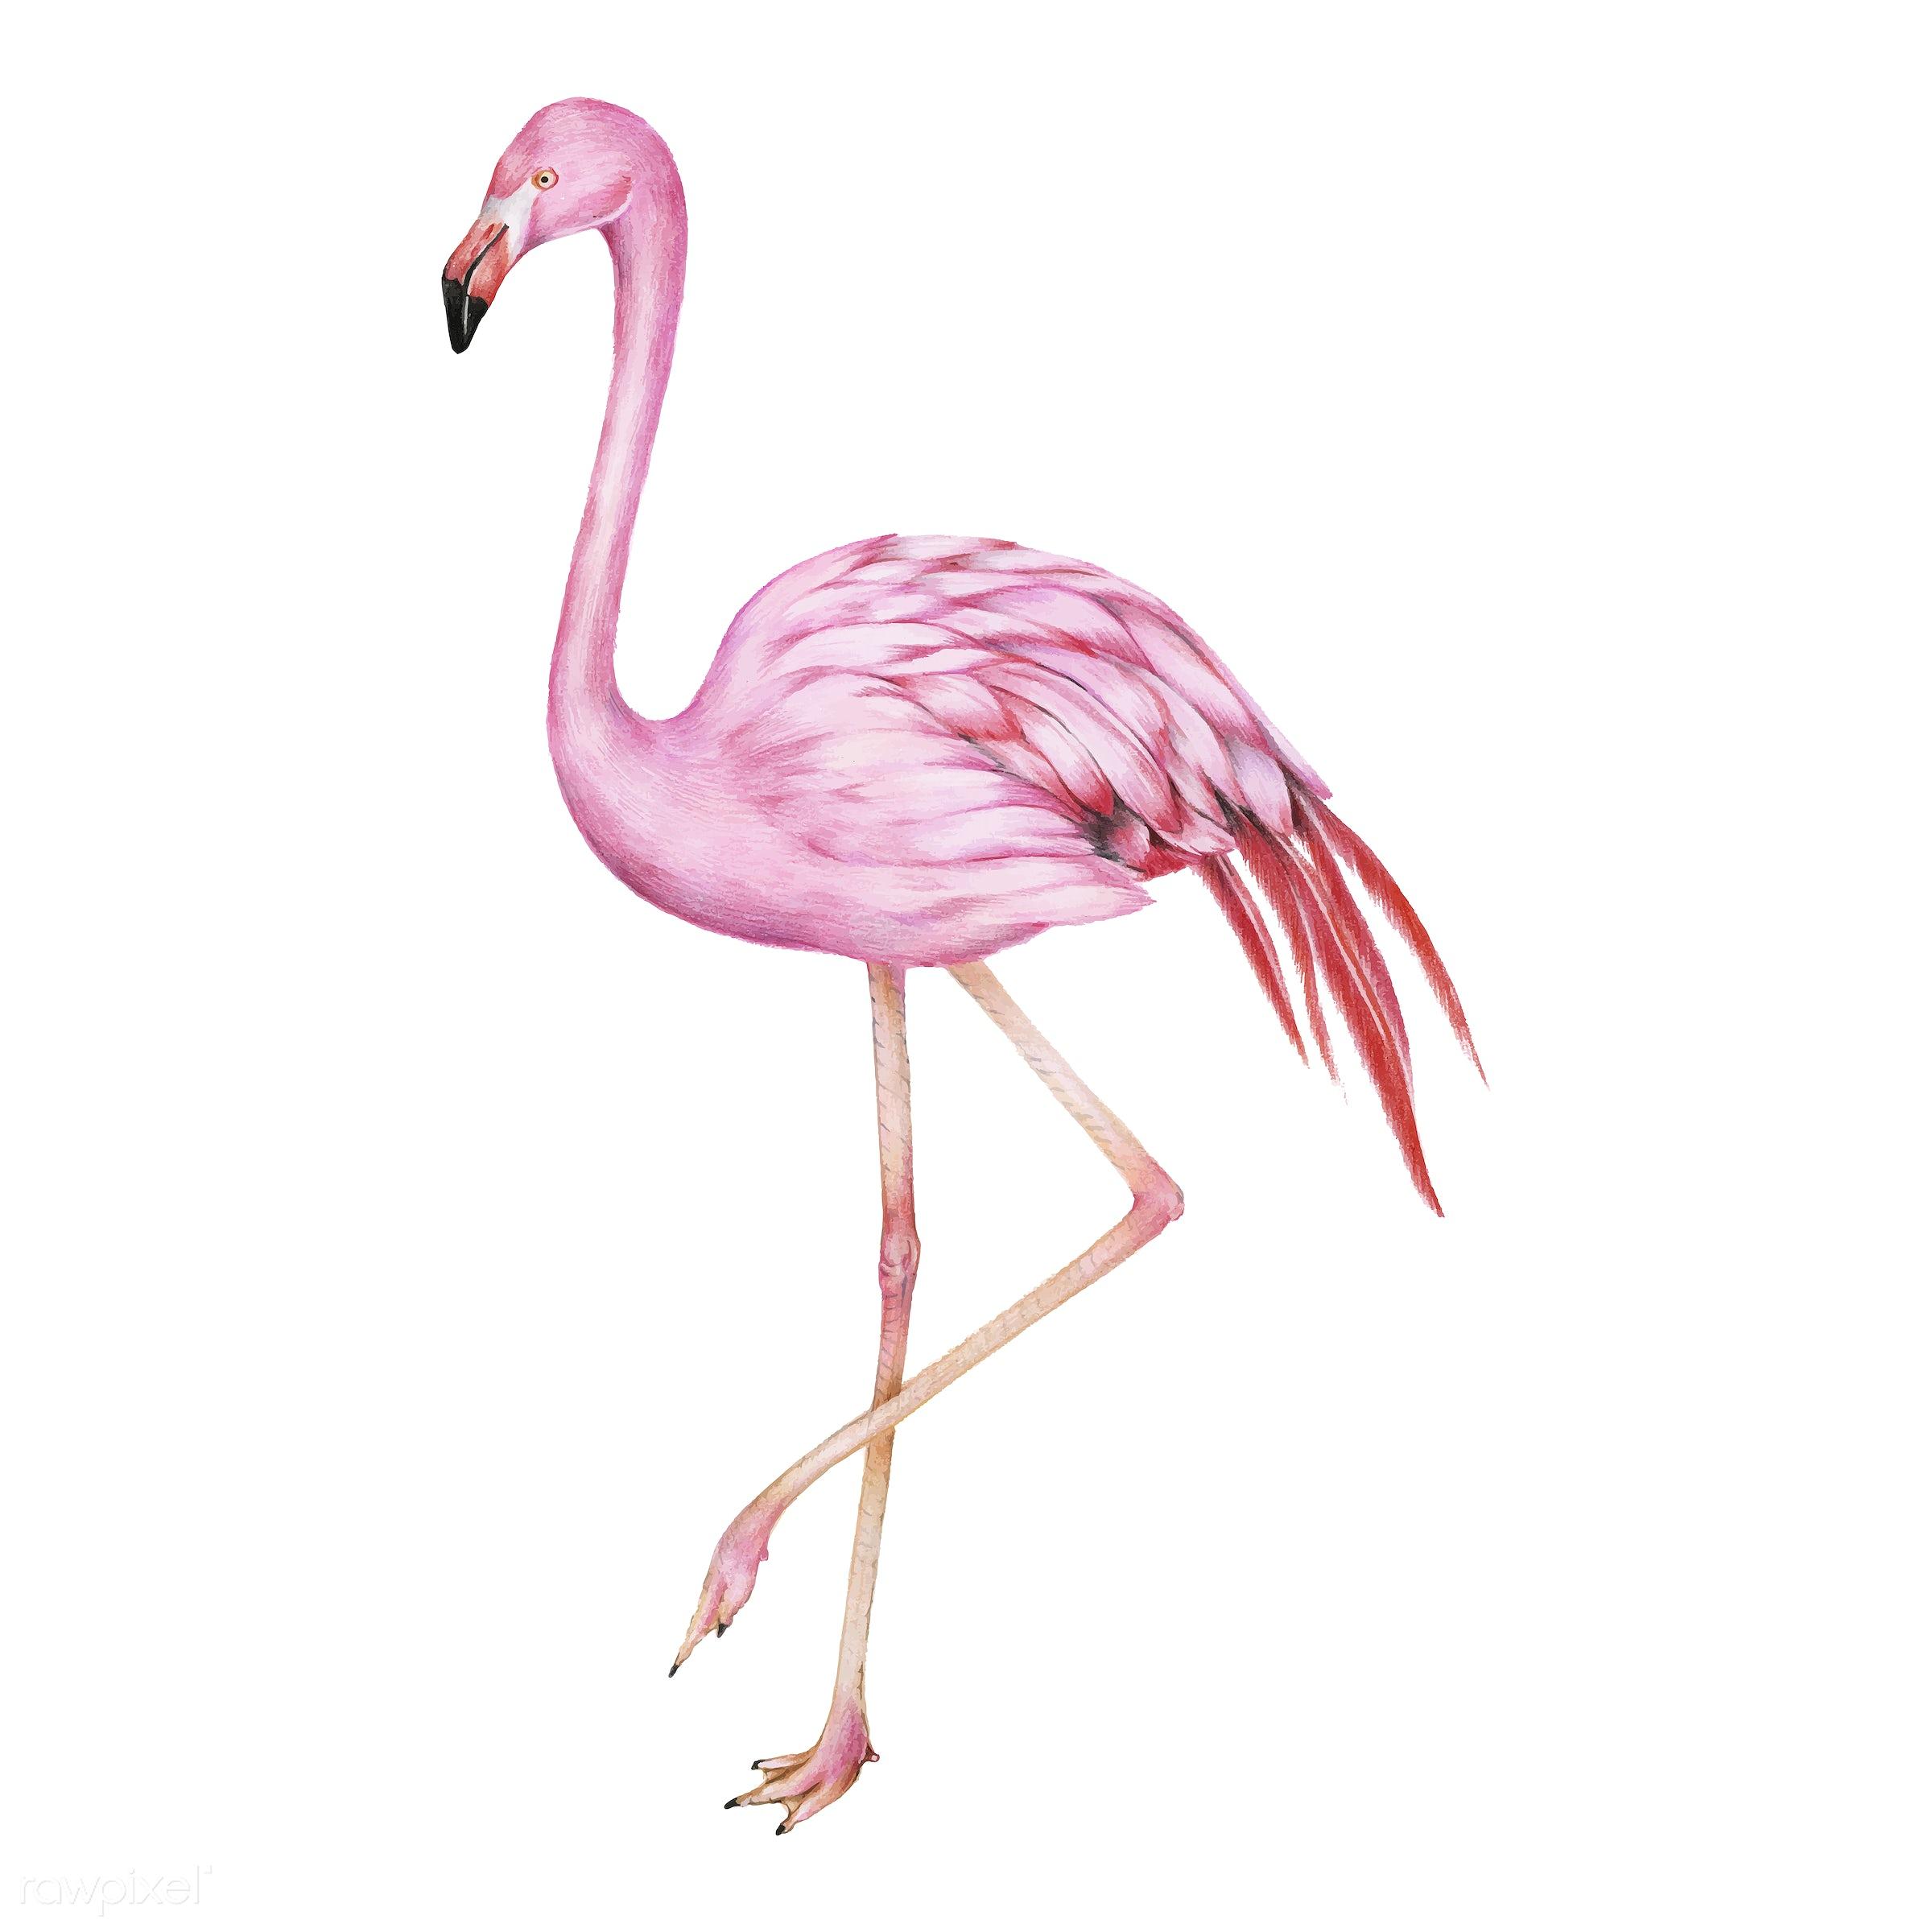 illustration of pink flamingo watercolor style. Black Bedroom Furniture Sets. Home Design Ideas